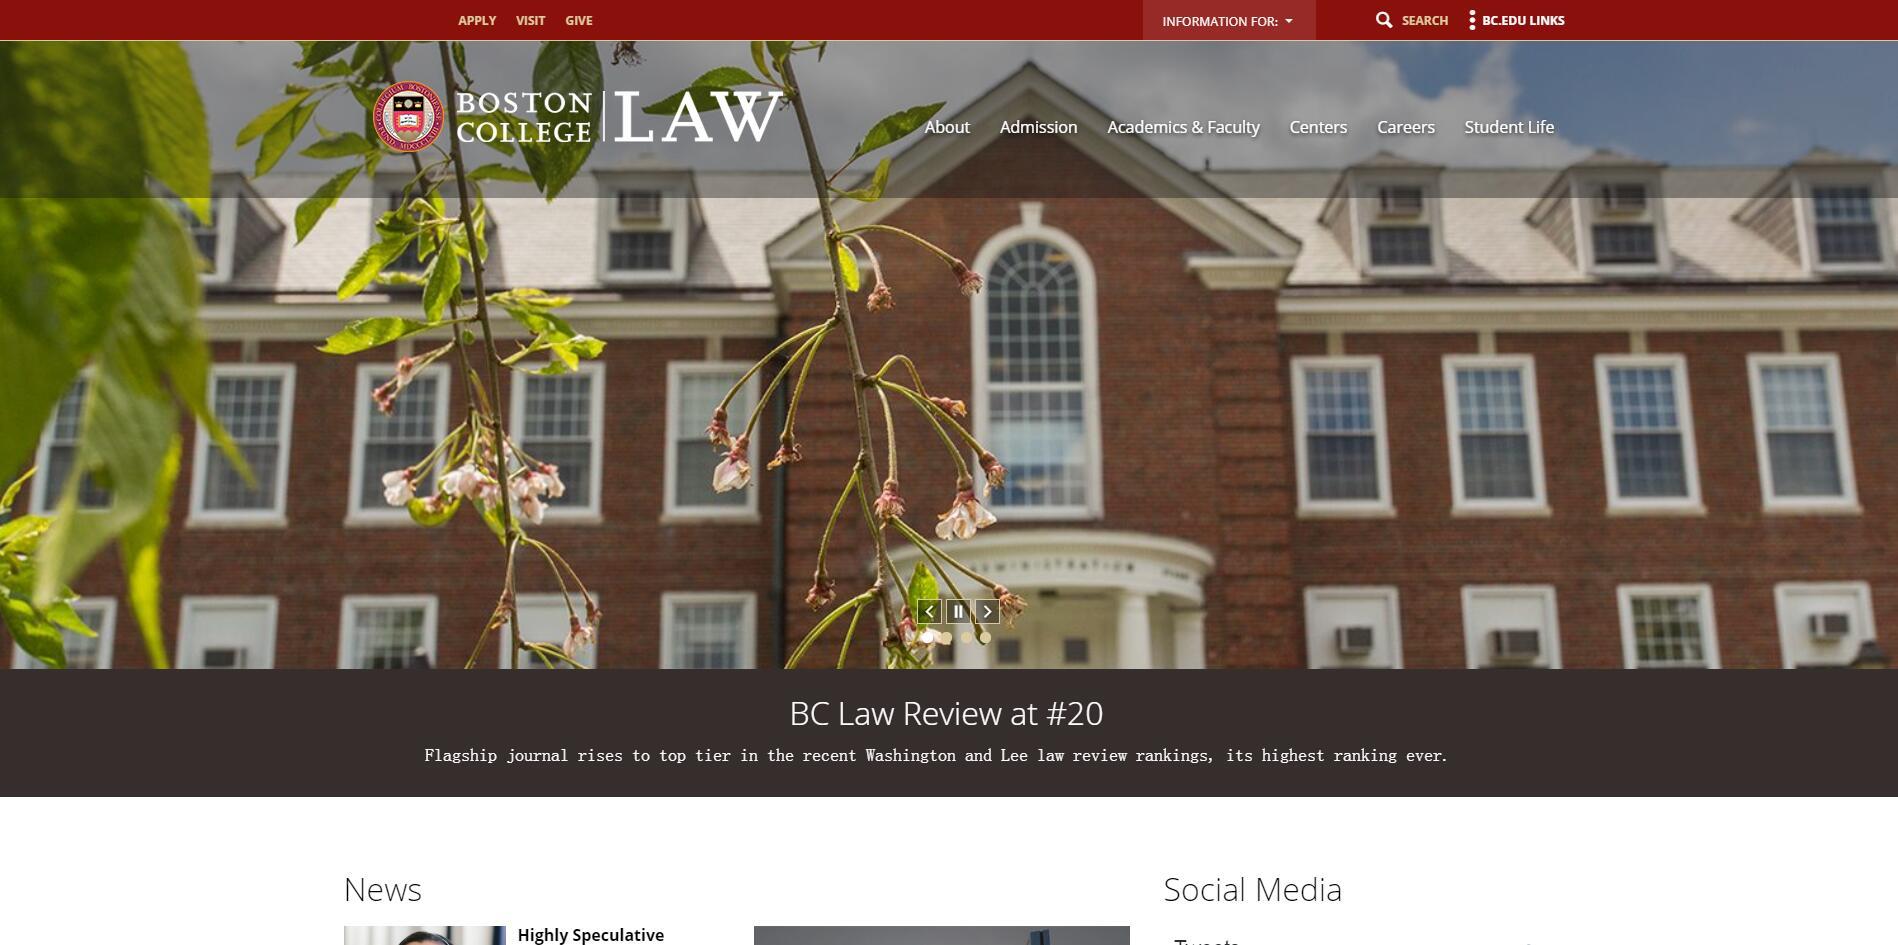 The Law School at Boston College